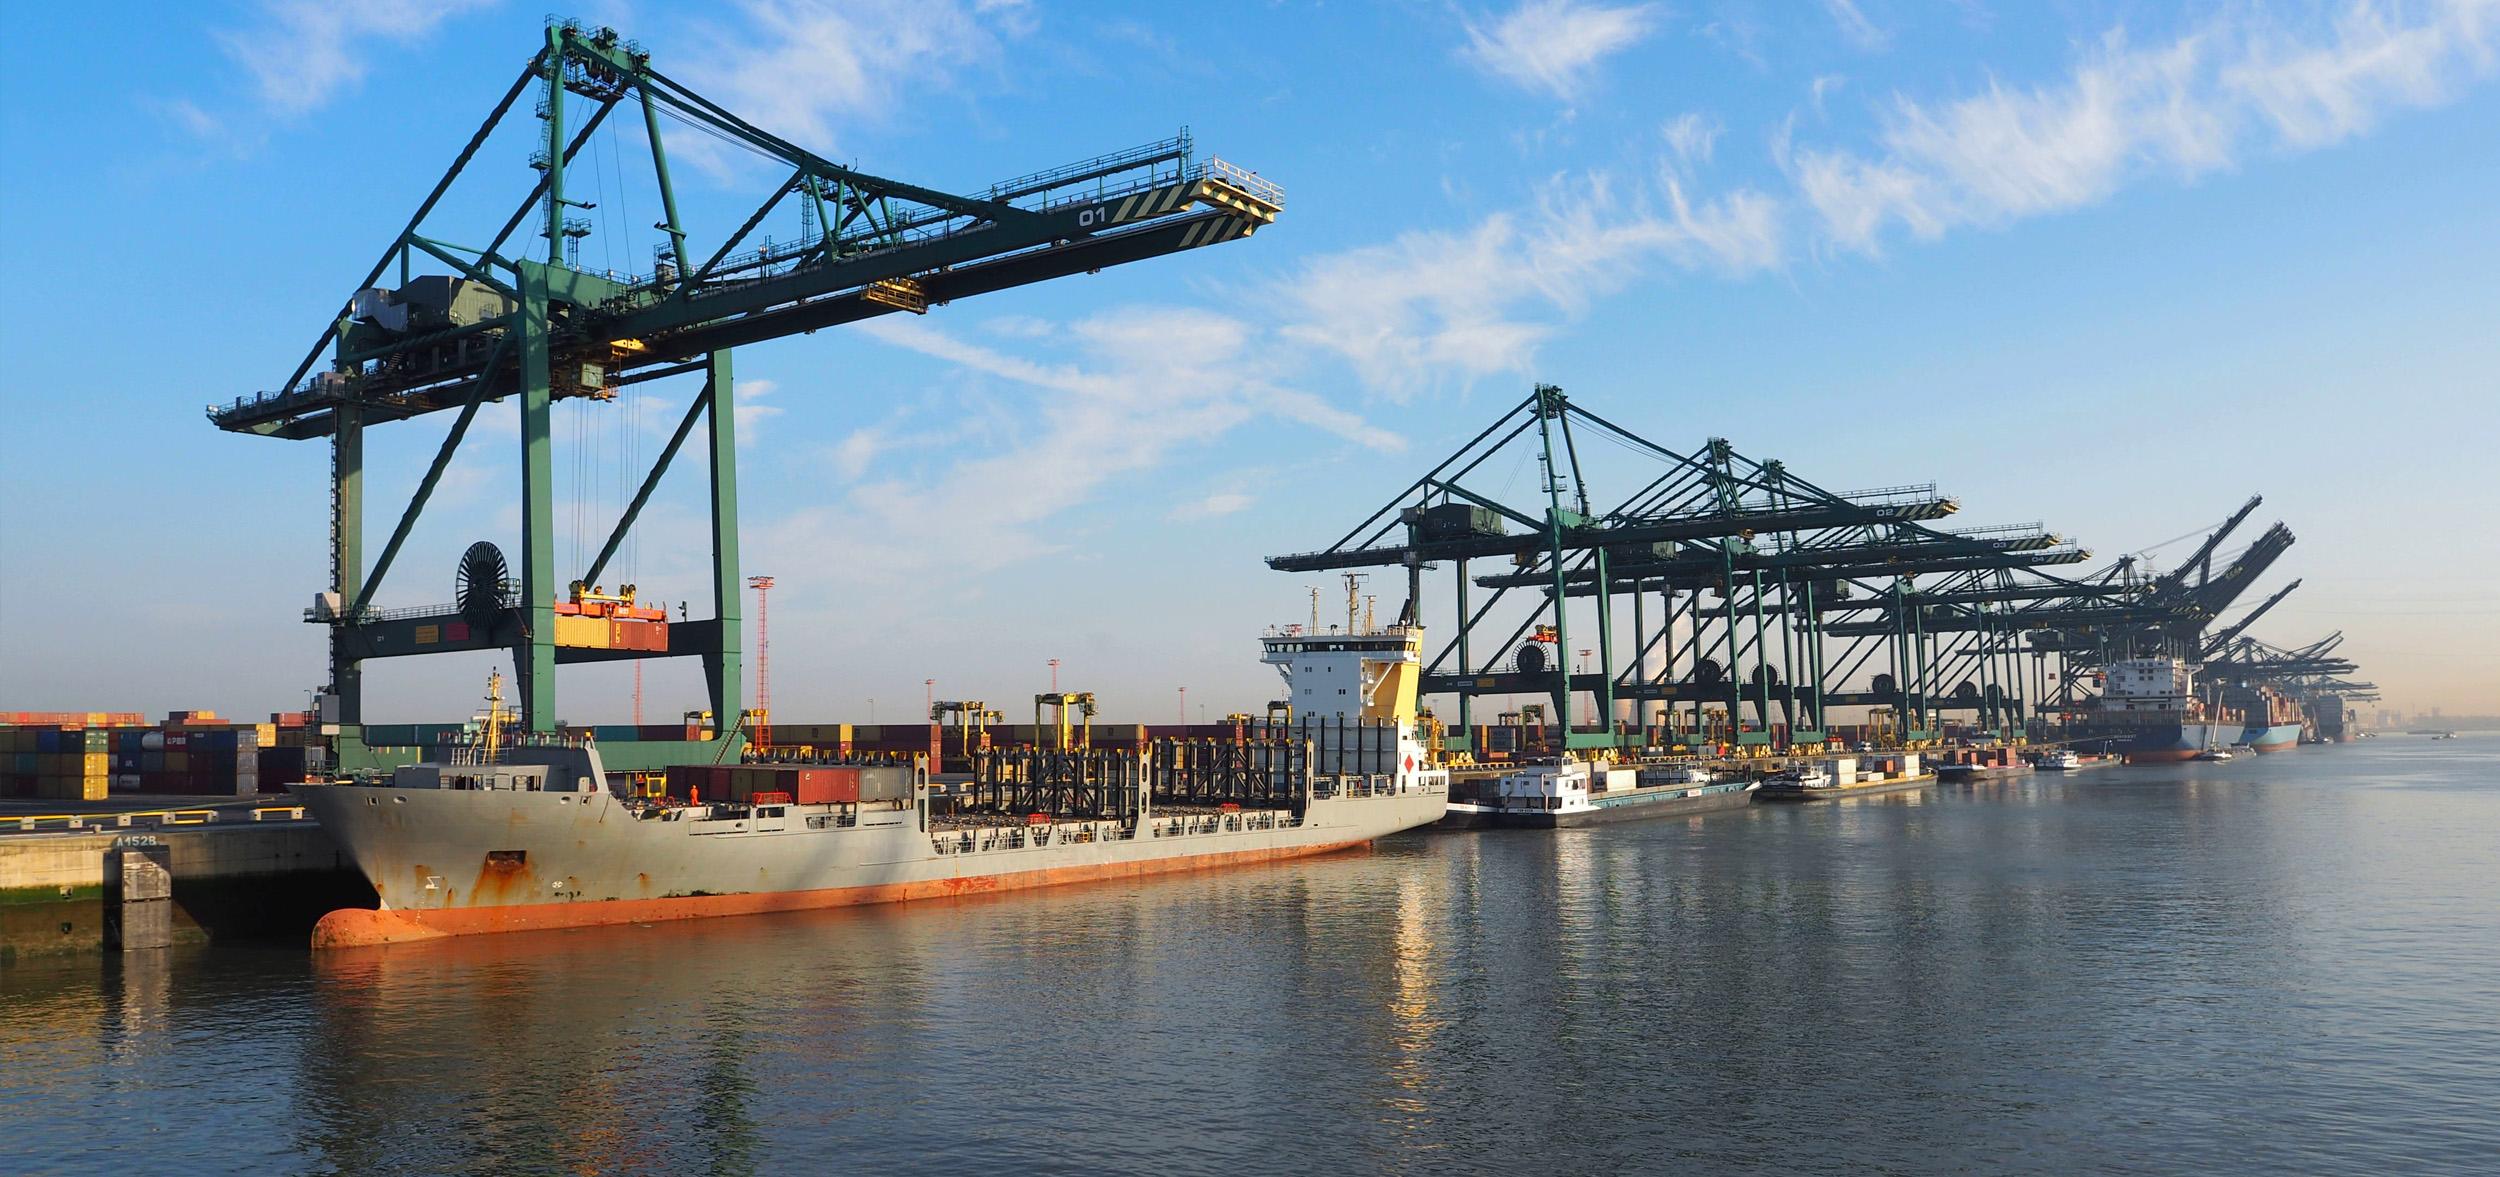 Obsin Harbour Security